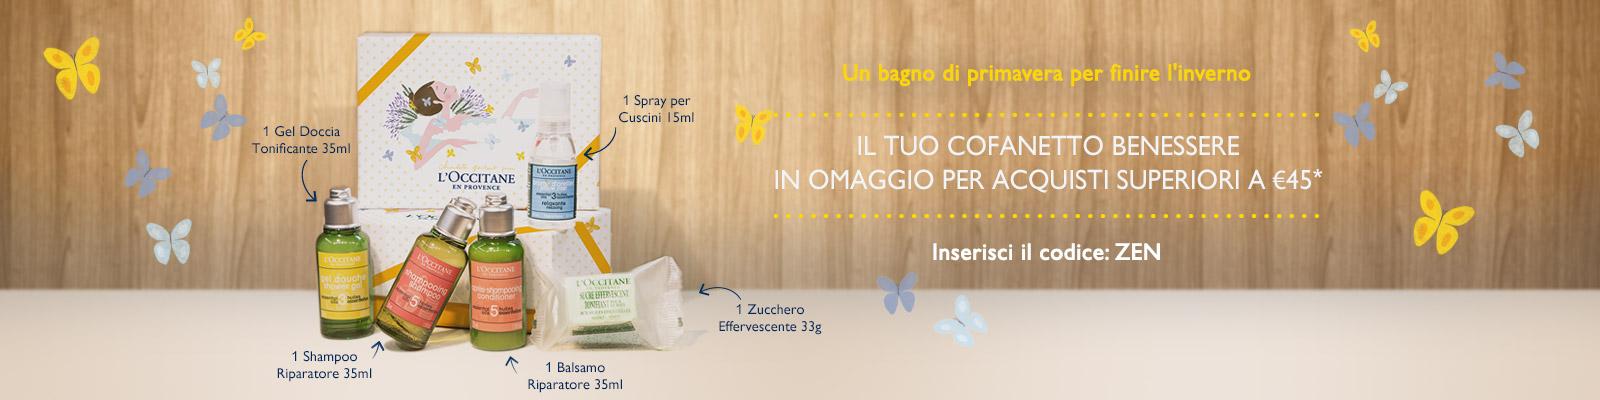 Offre Zen Box - L'Occitane